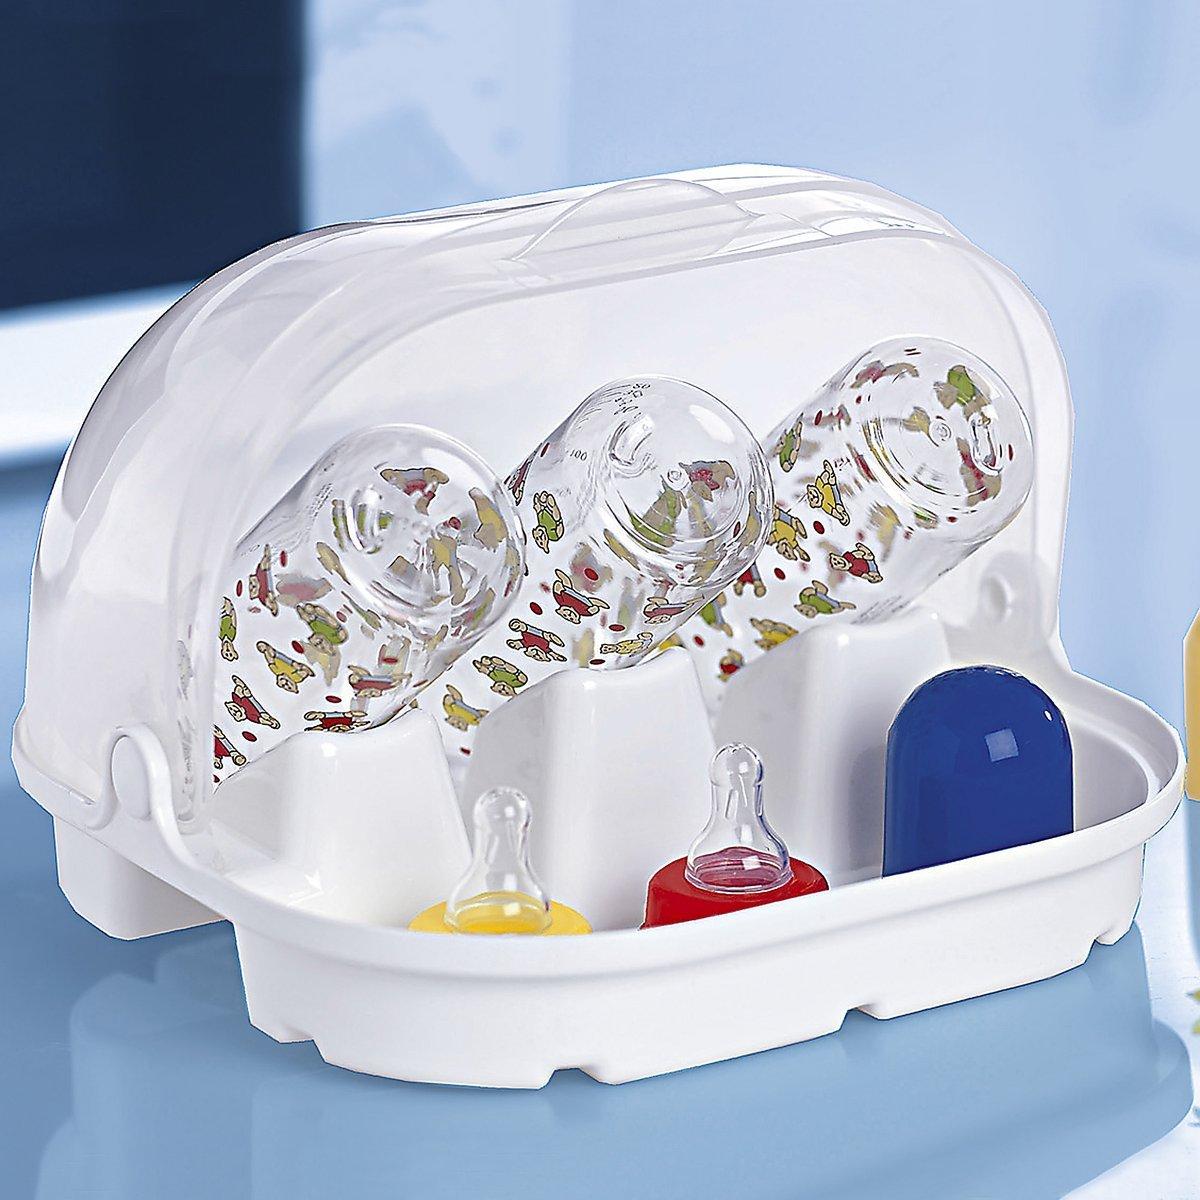 Mikrowellen-Sterilisator BABY-WALZ